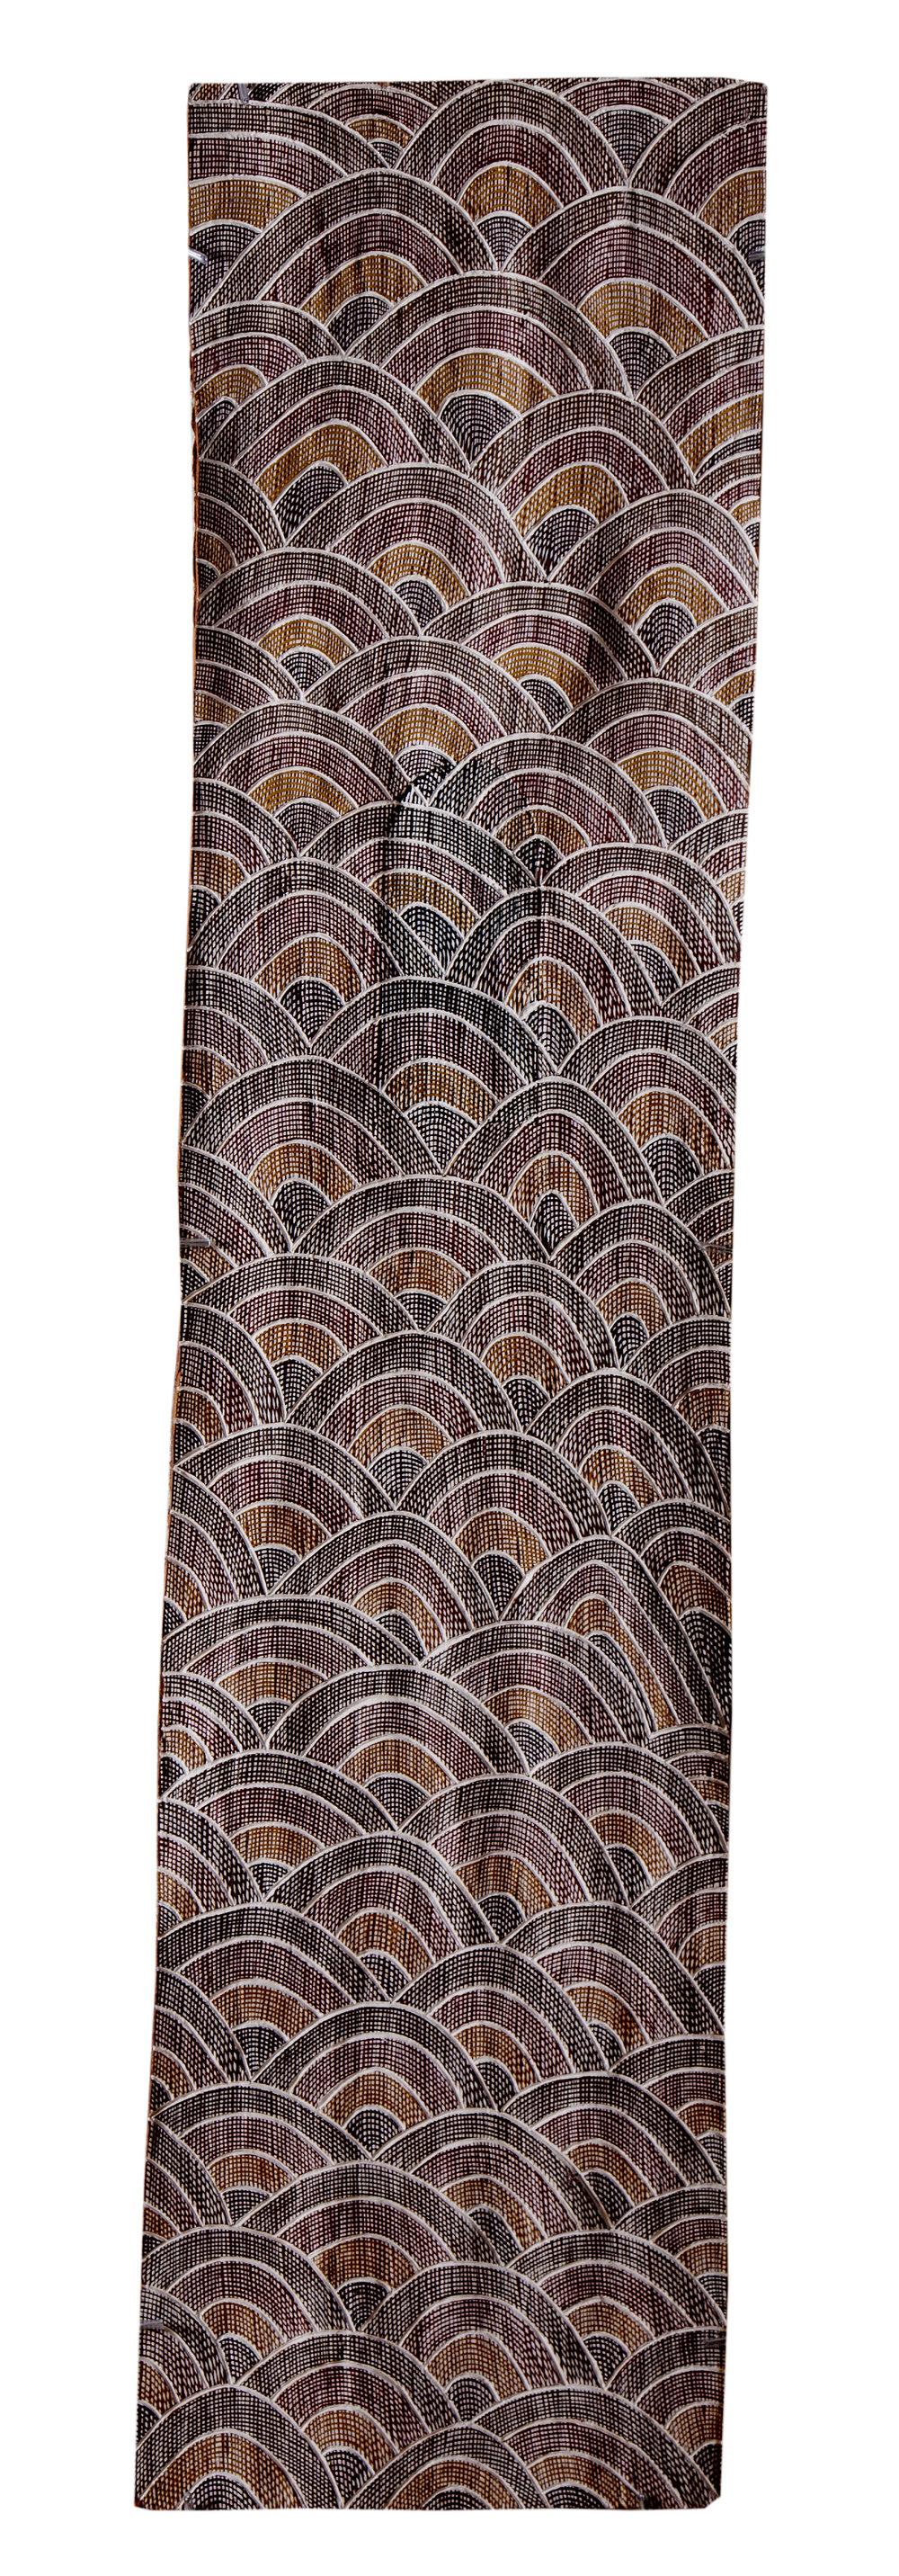 Dhurrumuwuy Marika   Untitled  Natural earth pigments on bark 140 x 34cm  Buku Larrnggay Mulka #4016D   EMAIL INQUIRY